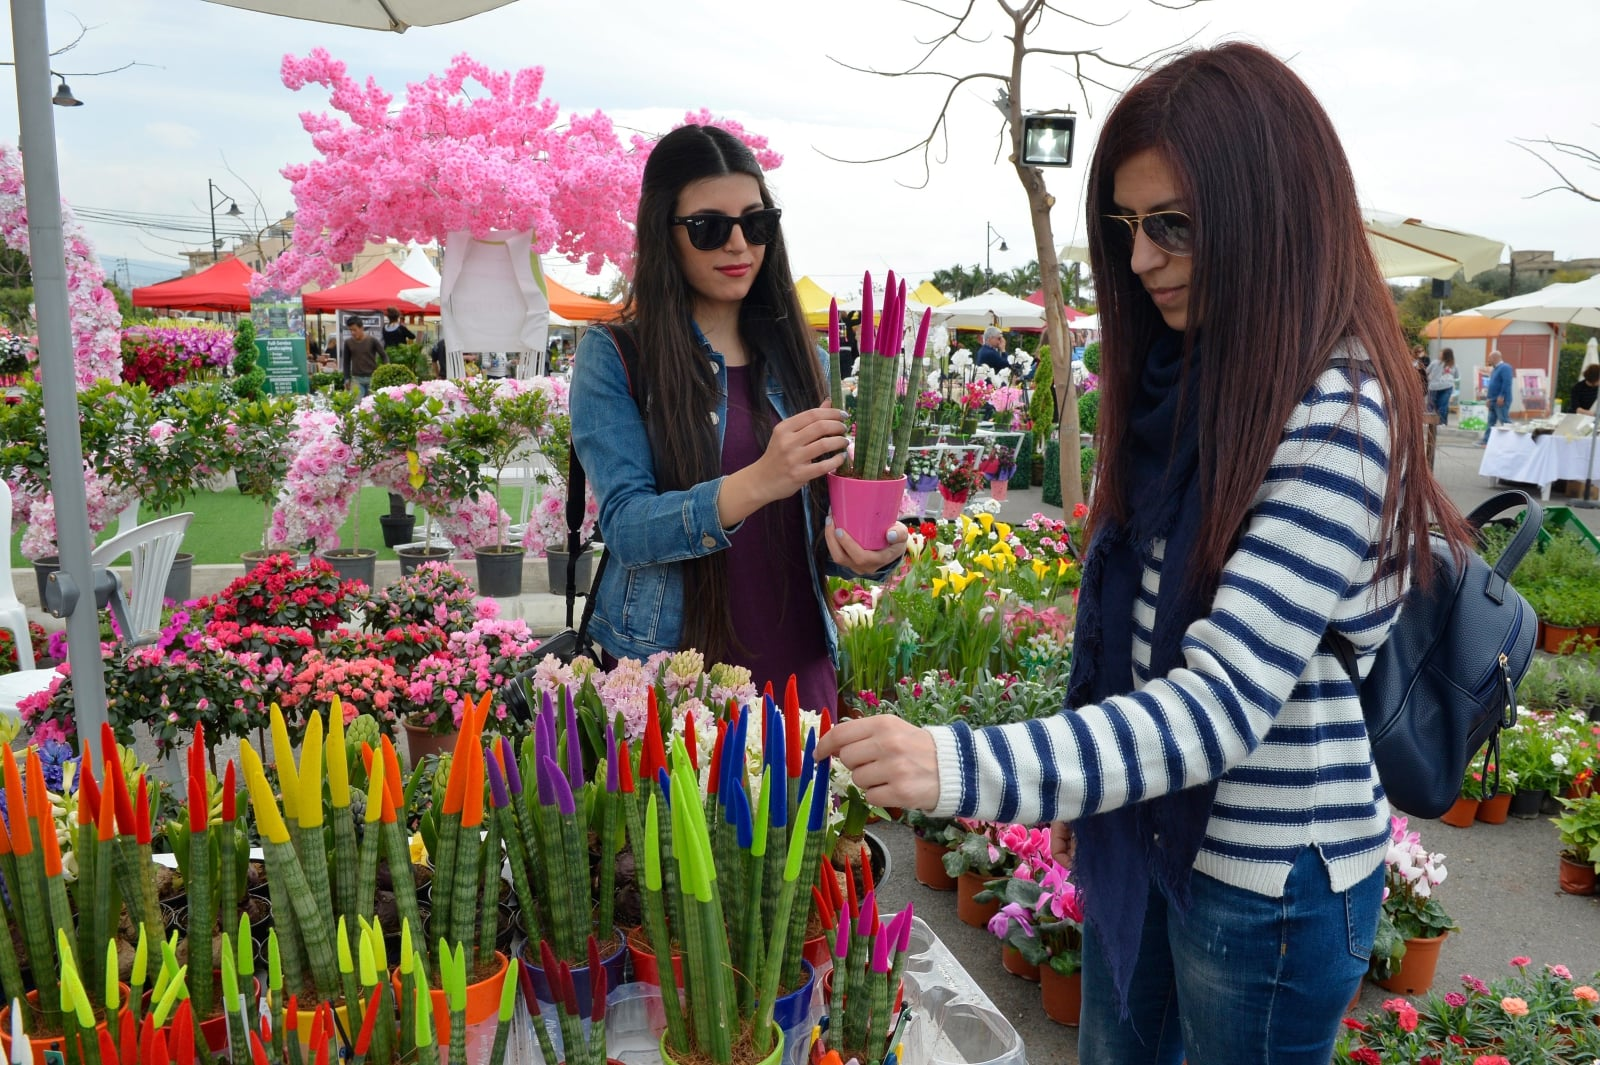 Wystawa kwiatów w Byblos, Liban, fot. EPA/WAEL HAMZEH